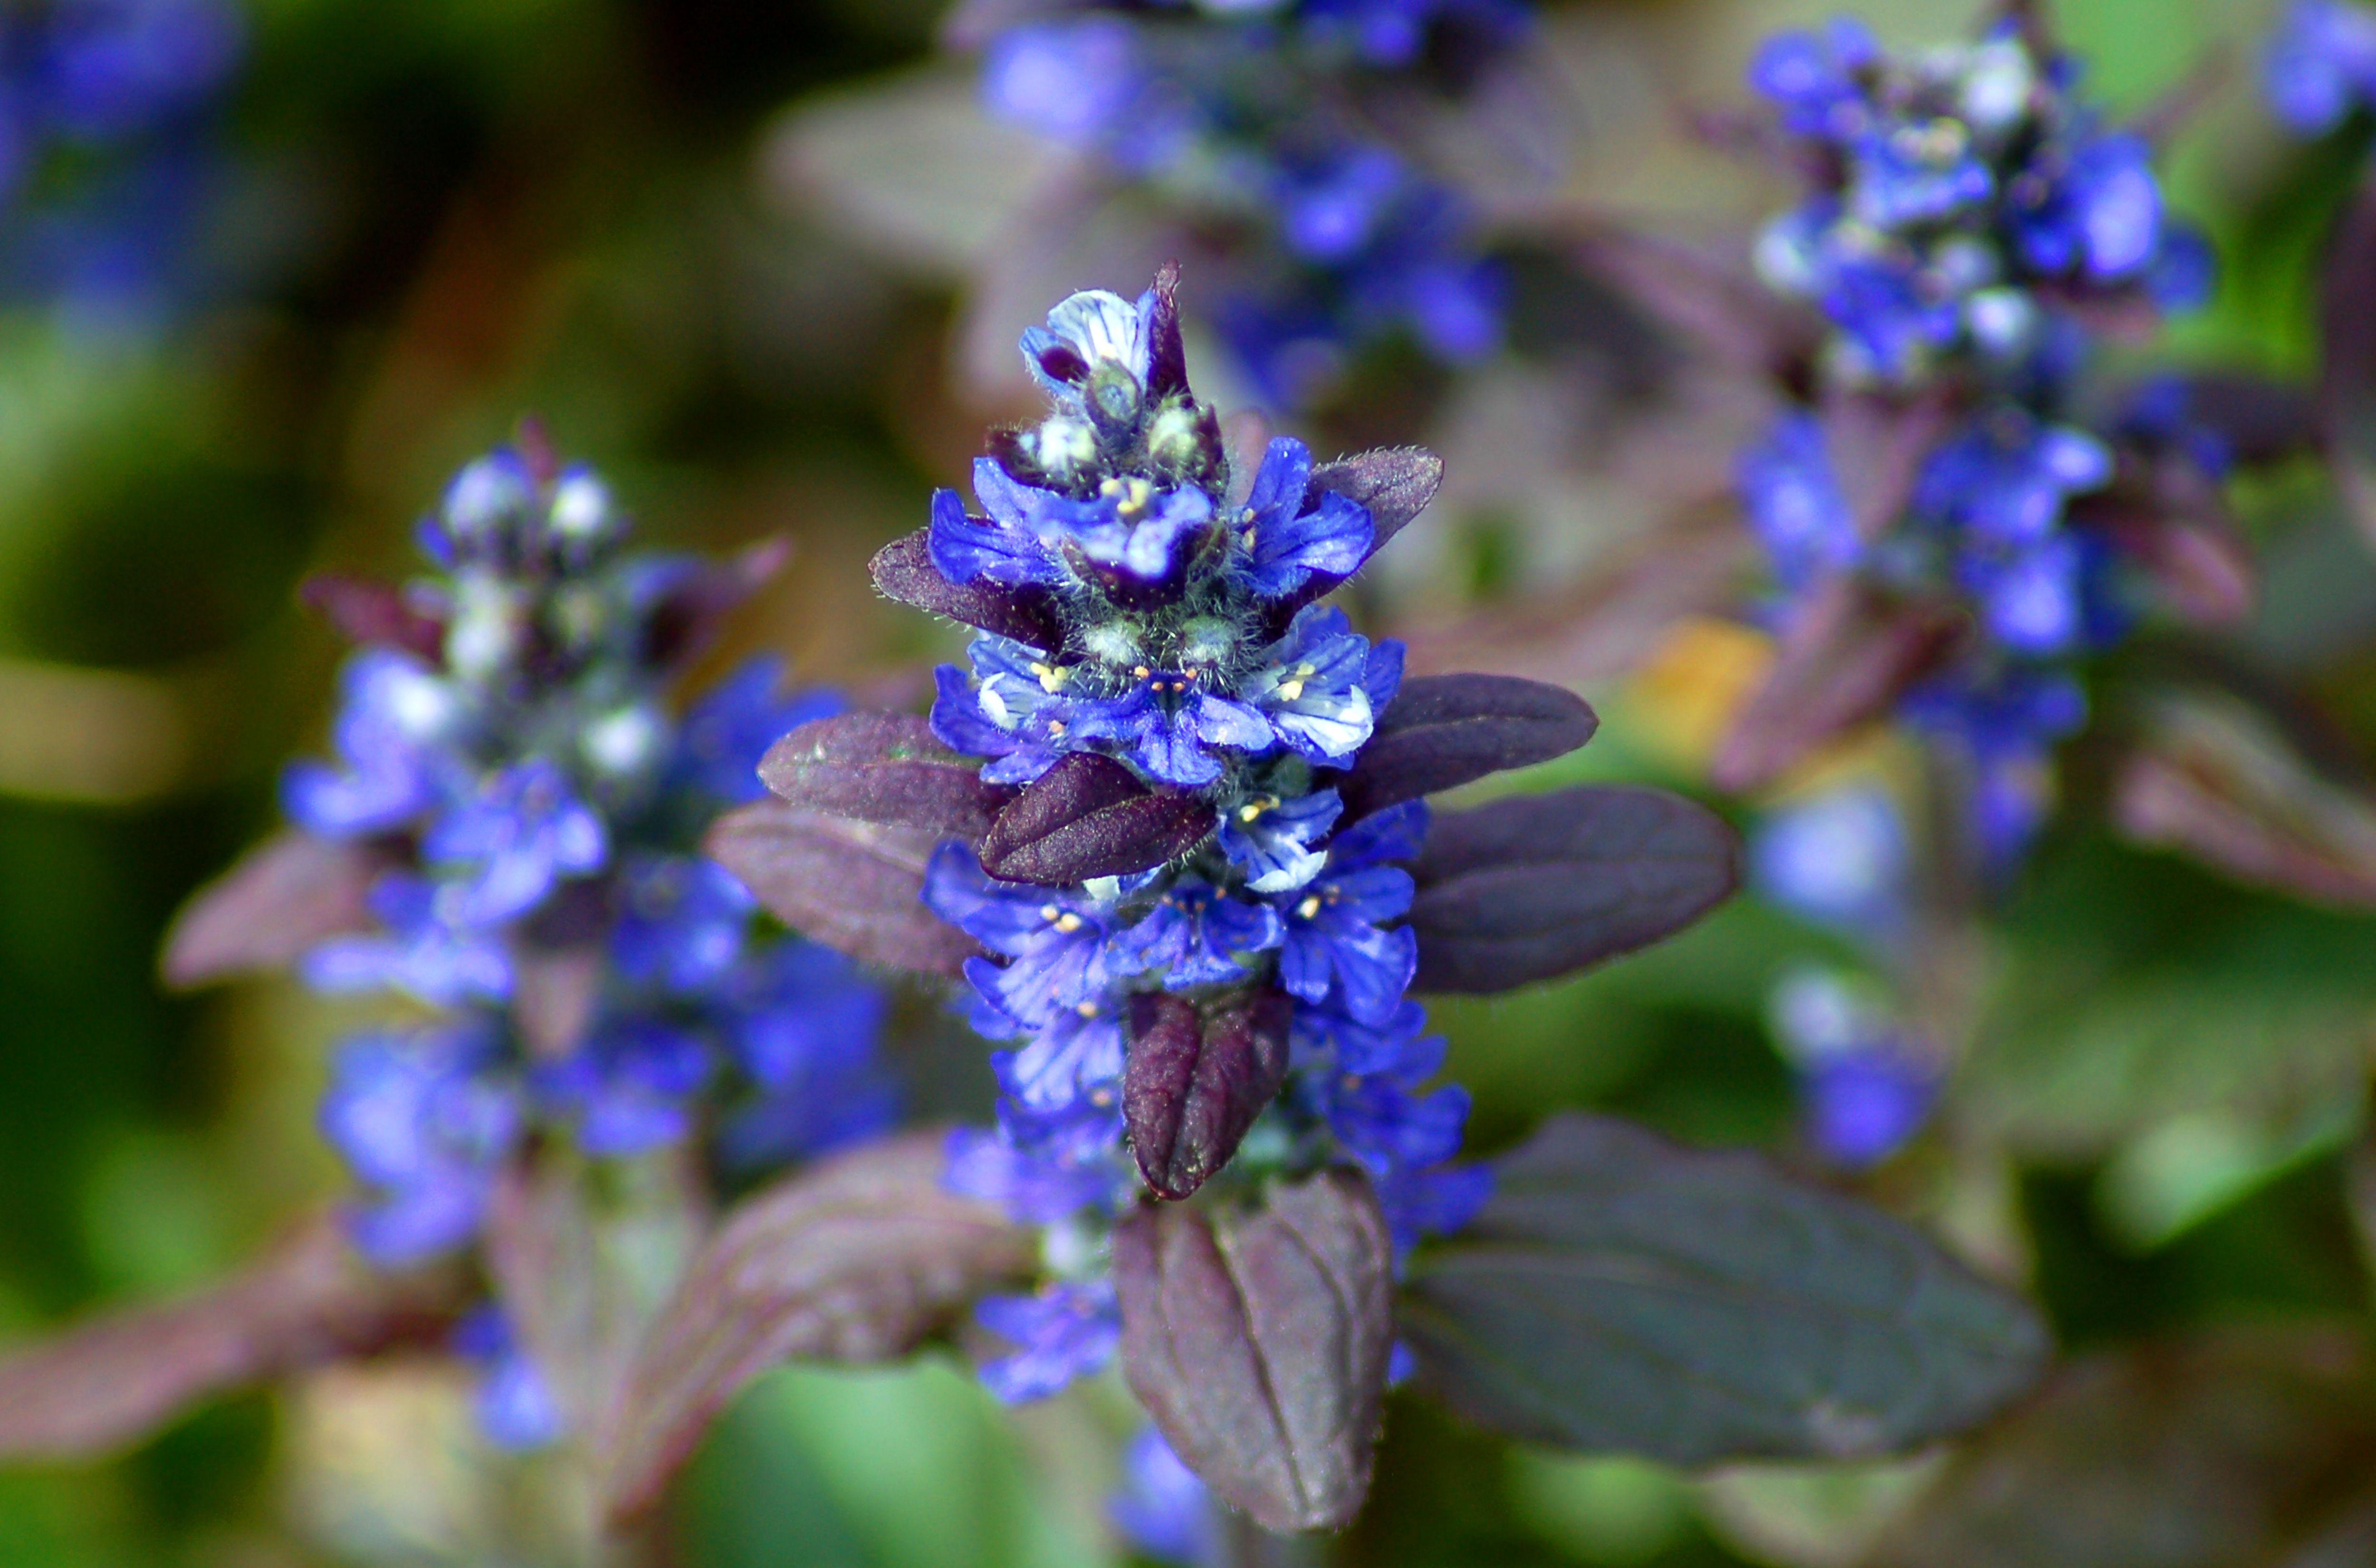 Ajuga plant with blue flowers.